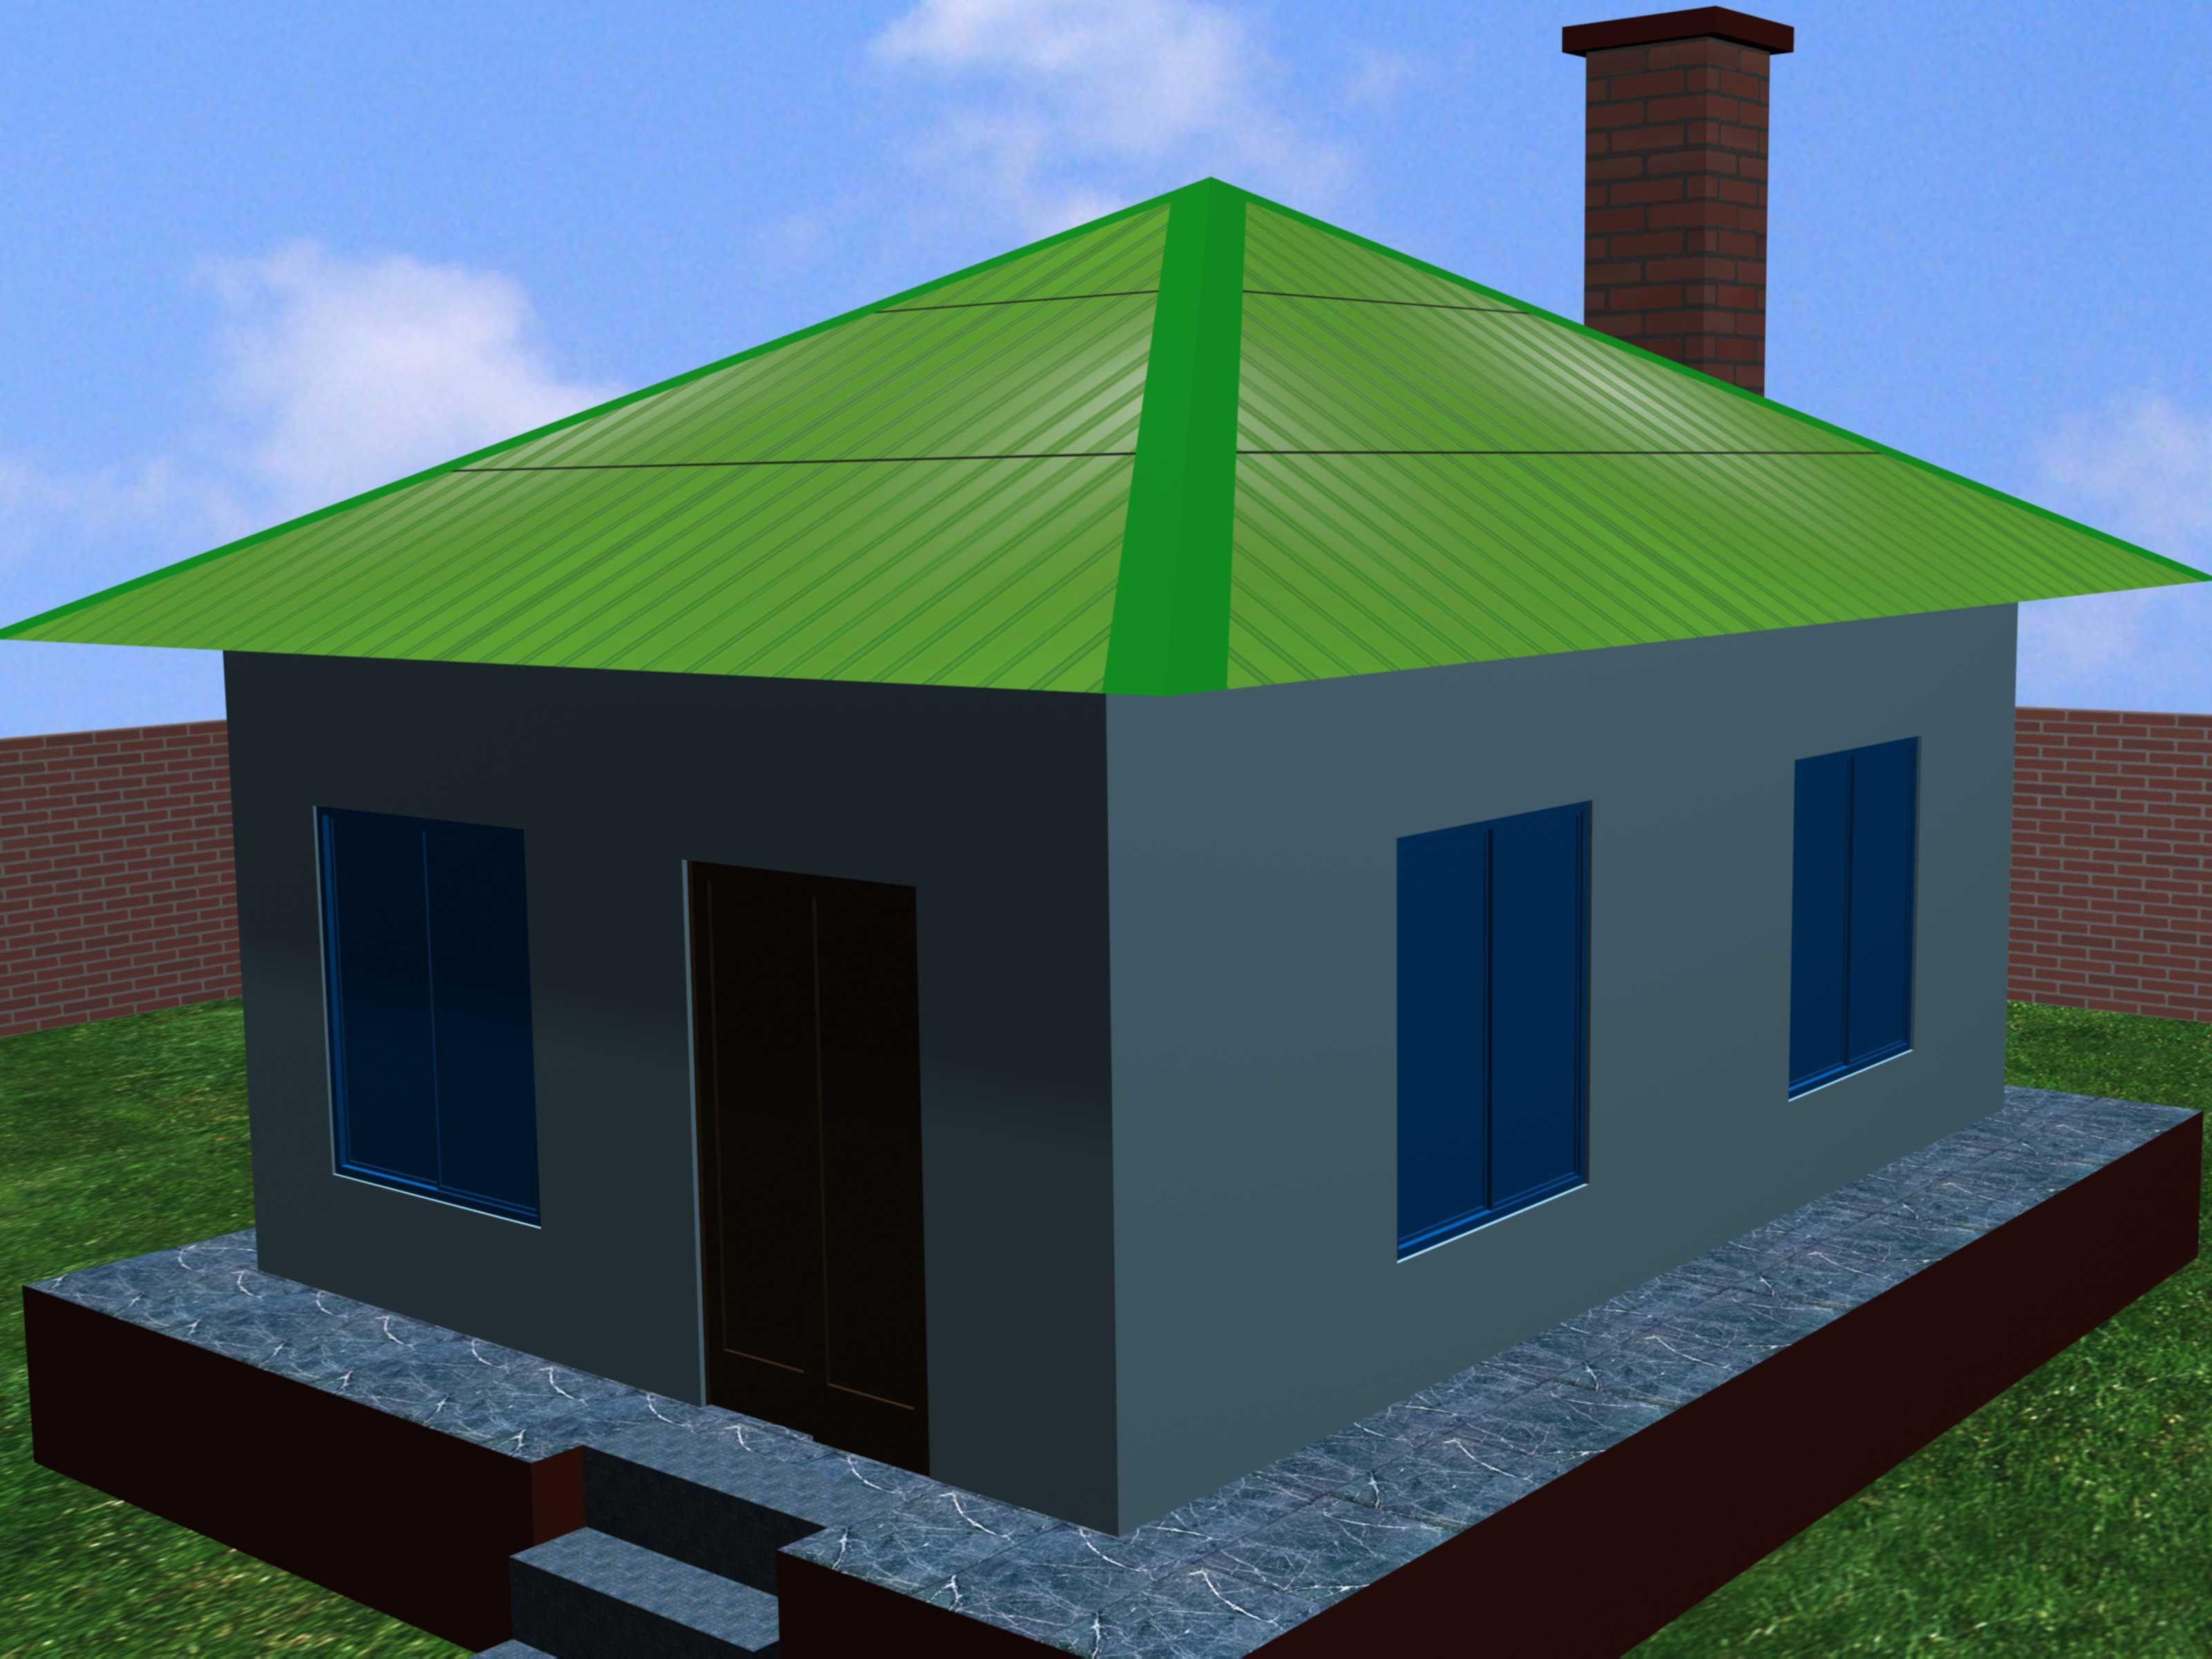 Install Metal Roofing Metal roof installation, Metal